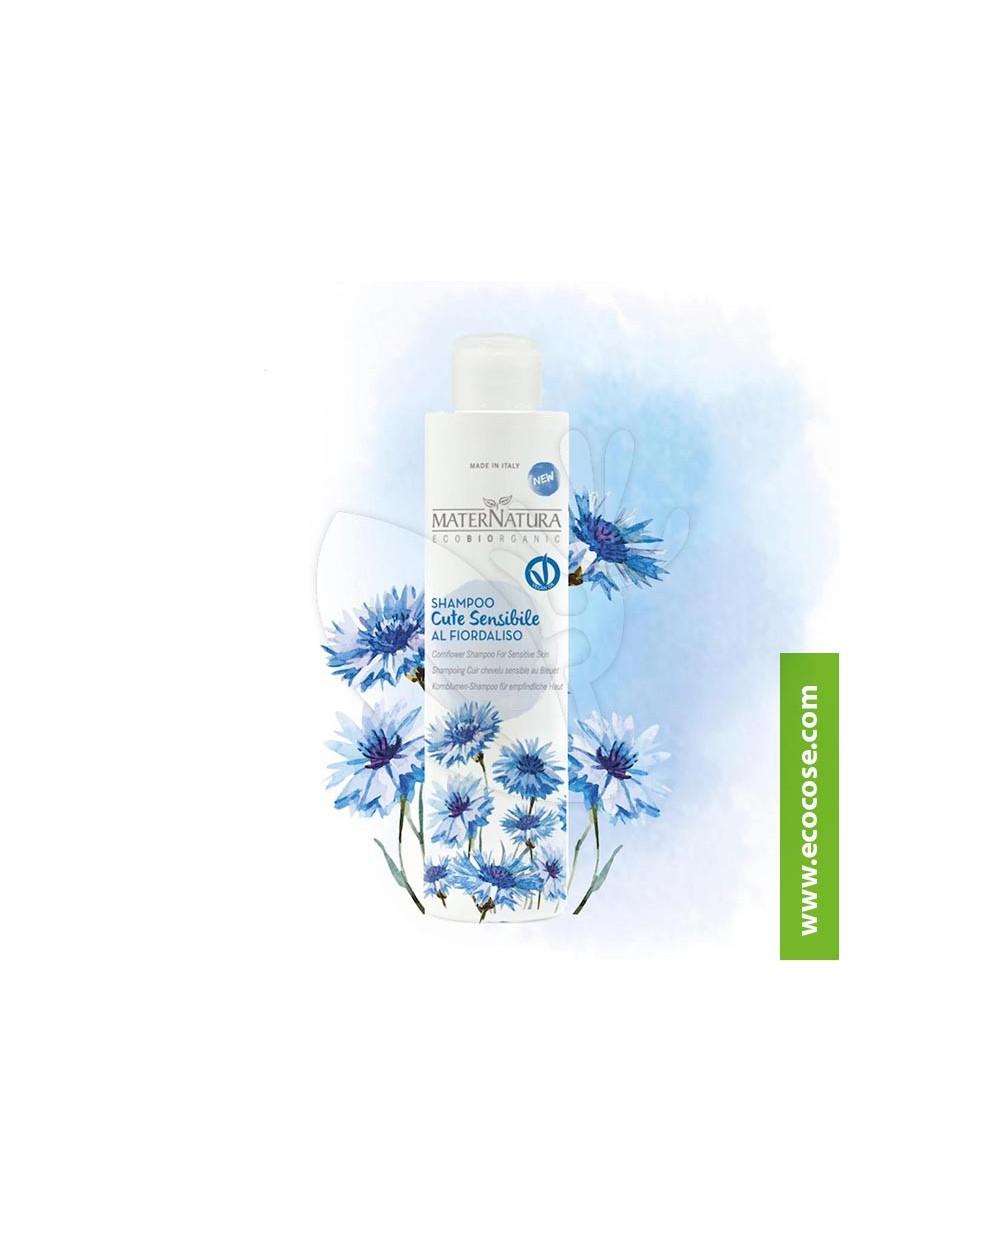 Maternatura - Shampoo cute sensibile al Fiordaliso